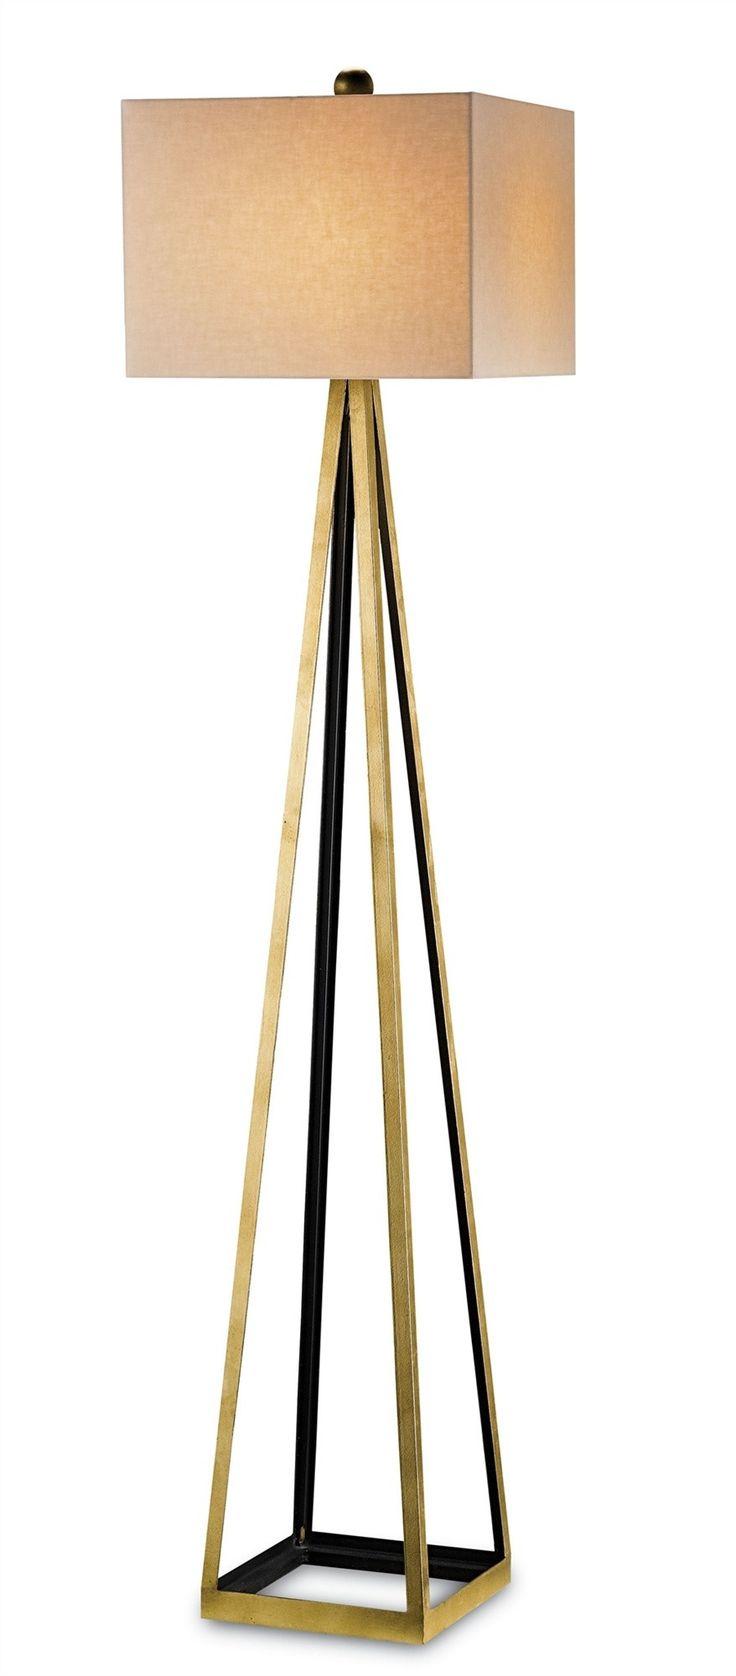 Threshold torchiere floor lamp textured bronze 65 - Best 25 Gold Floor Lamp Ideas On Pinterest Decorative Floor Lamps Lamps R Us And Brass Floor Lamp